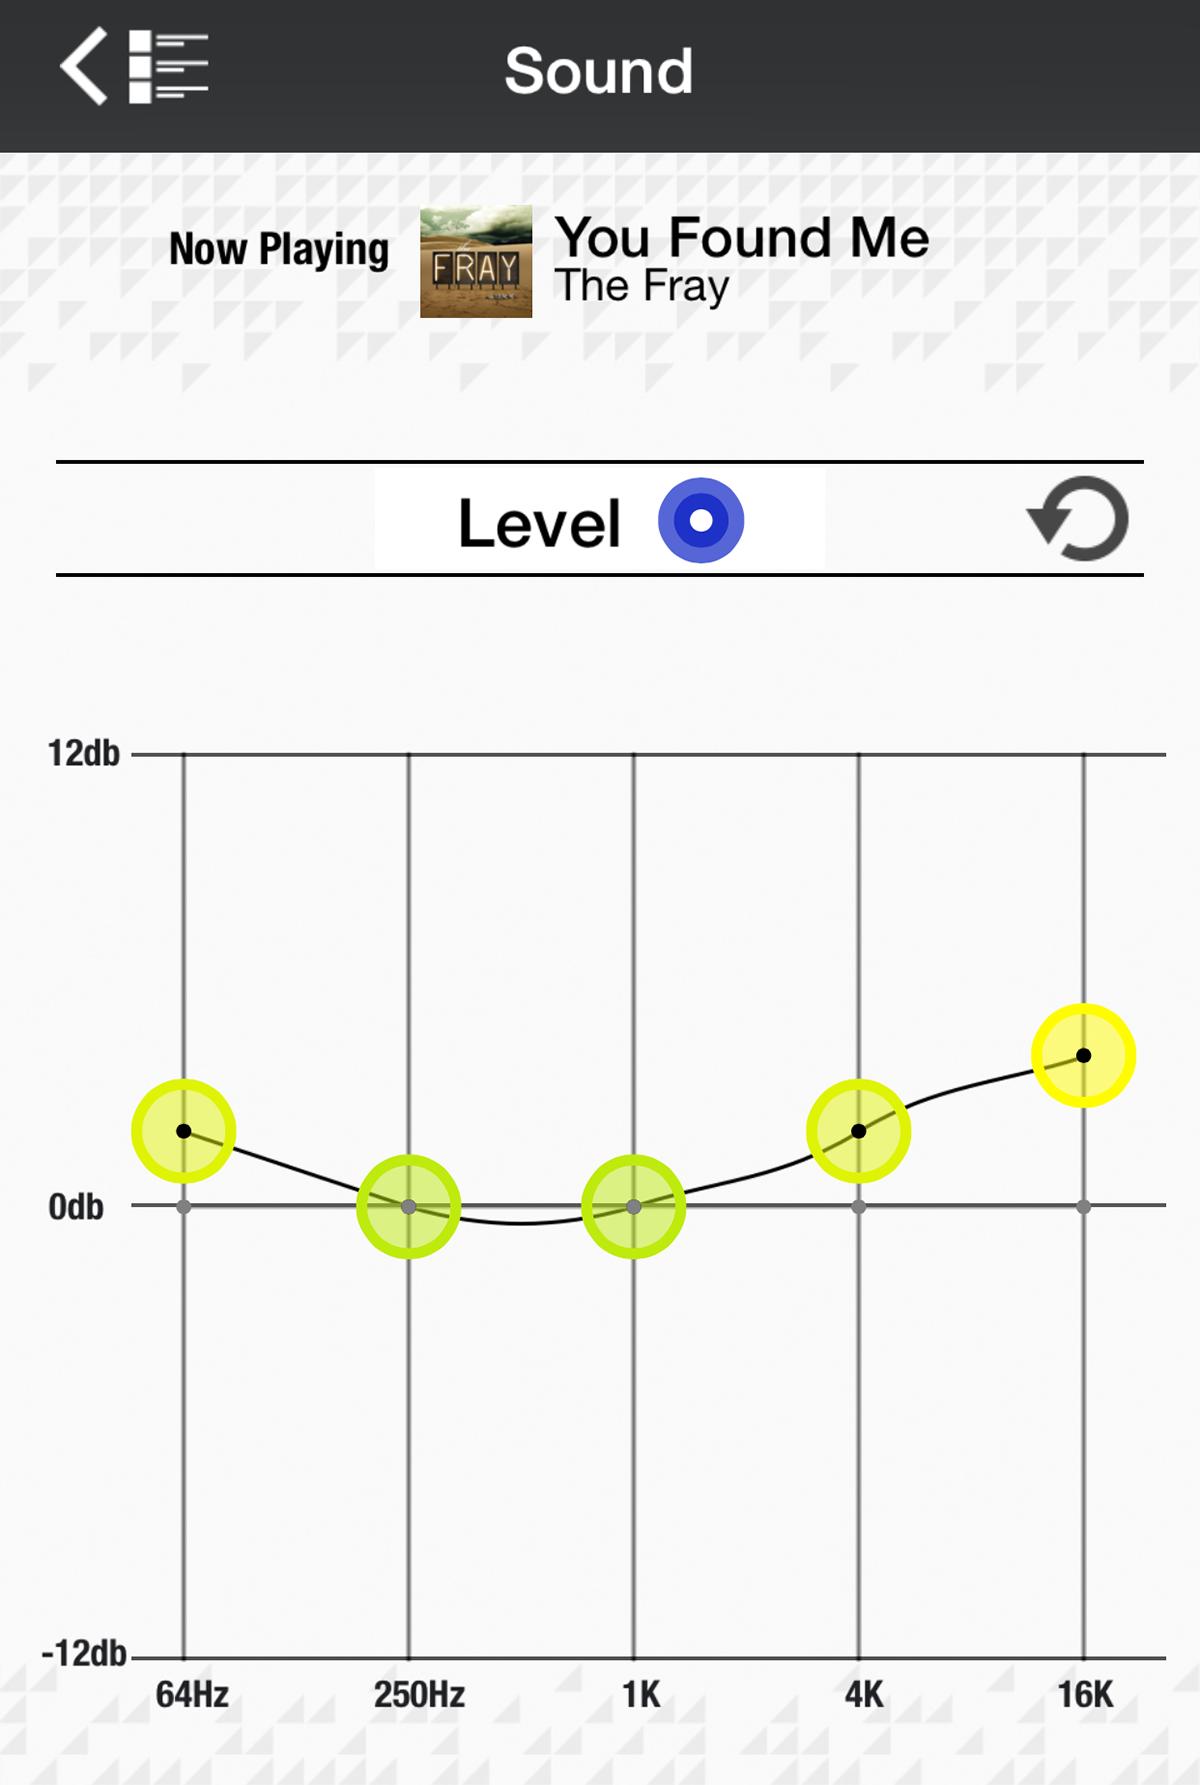 alpine-level-play-ios-app-eq-bass-settings.png